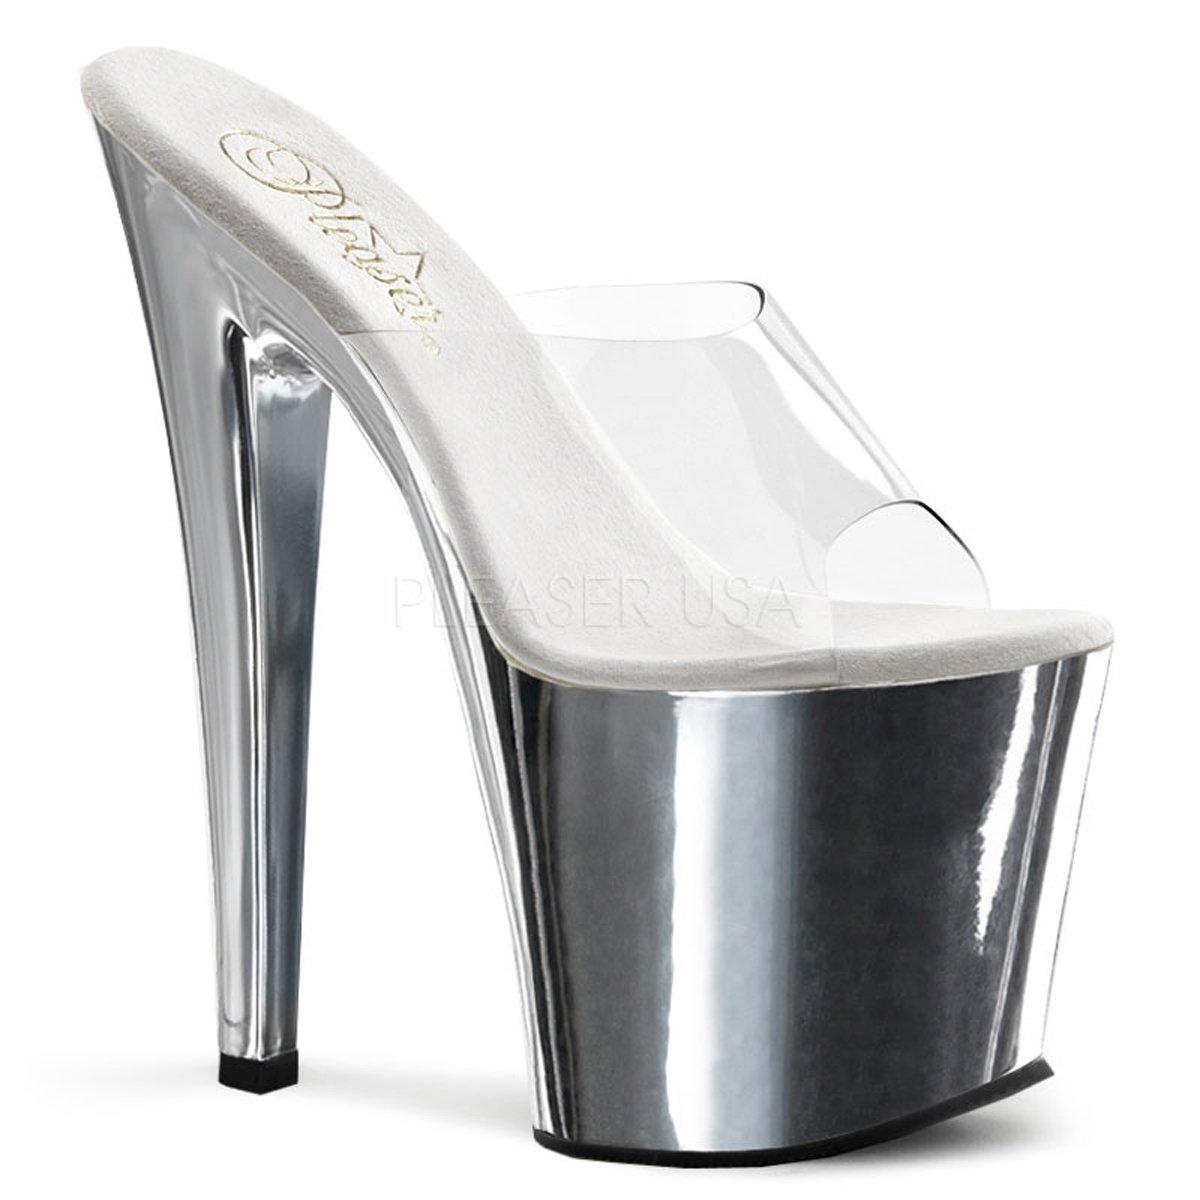 Pleaser Taboo-701 Exotic Dancer, Clubwear Super High 7 1/2 Platform Sexy Sandal. B01G4EVCN4 10 B(M) US|Clear/Silver/Chrome